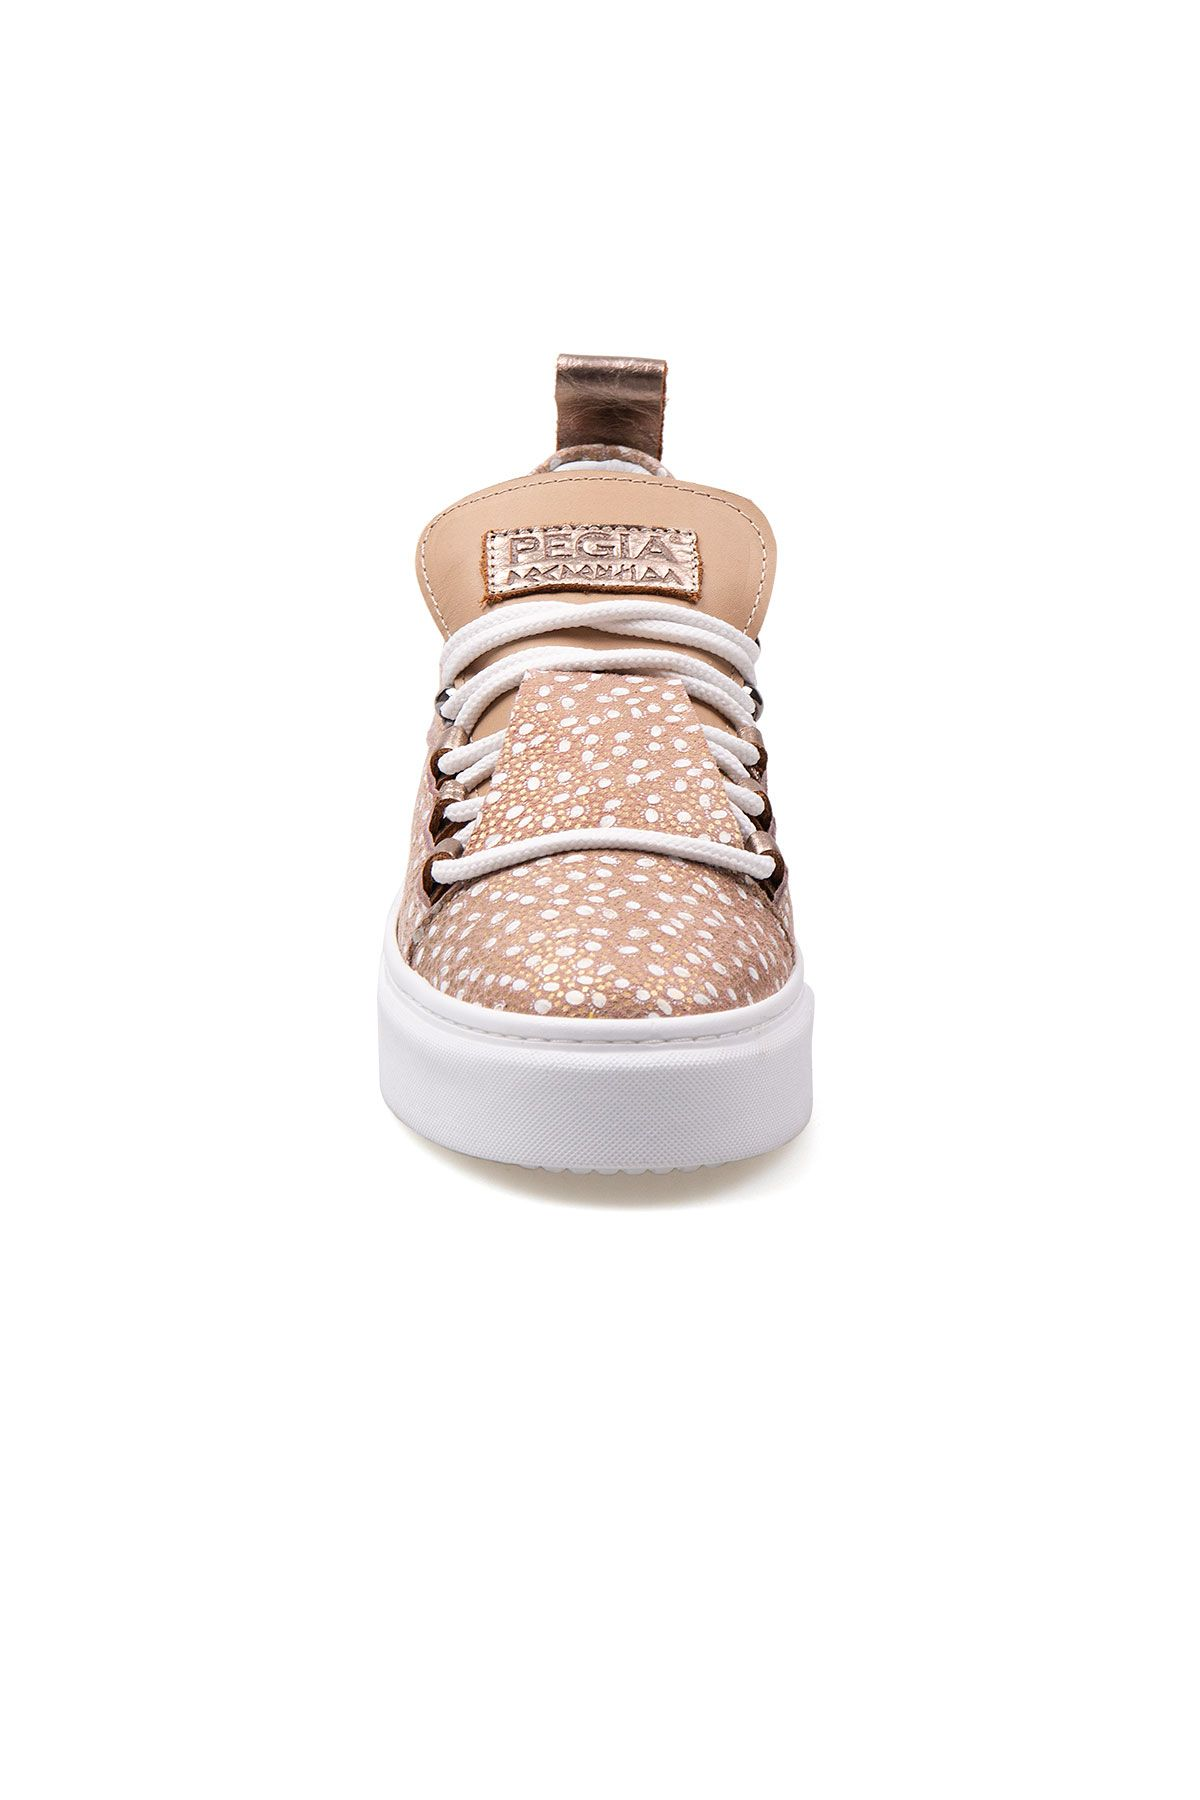 Pegia Genuine Leather Women's Sneaker LA1707 Powdery